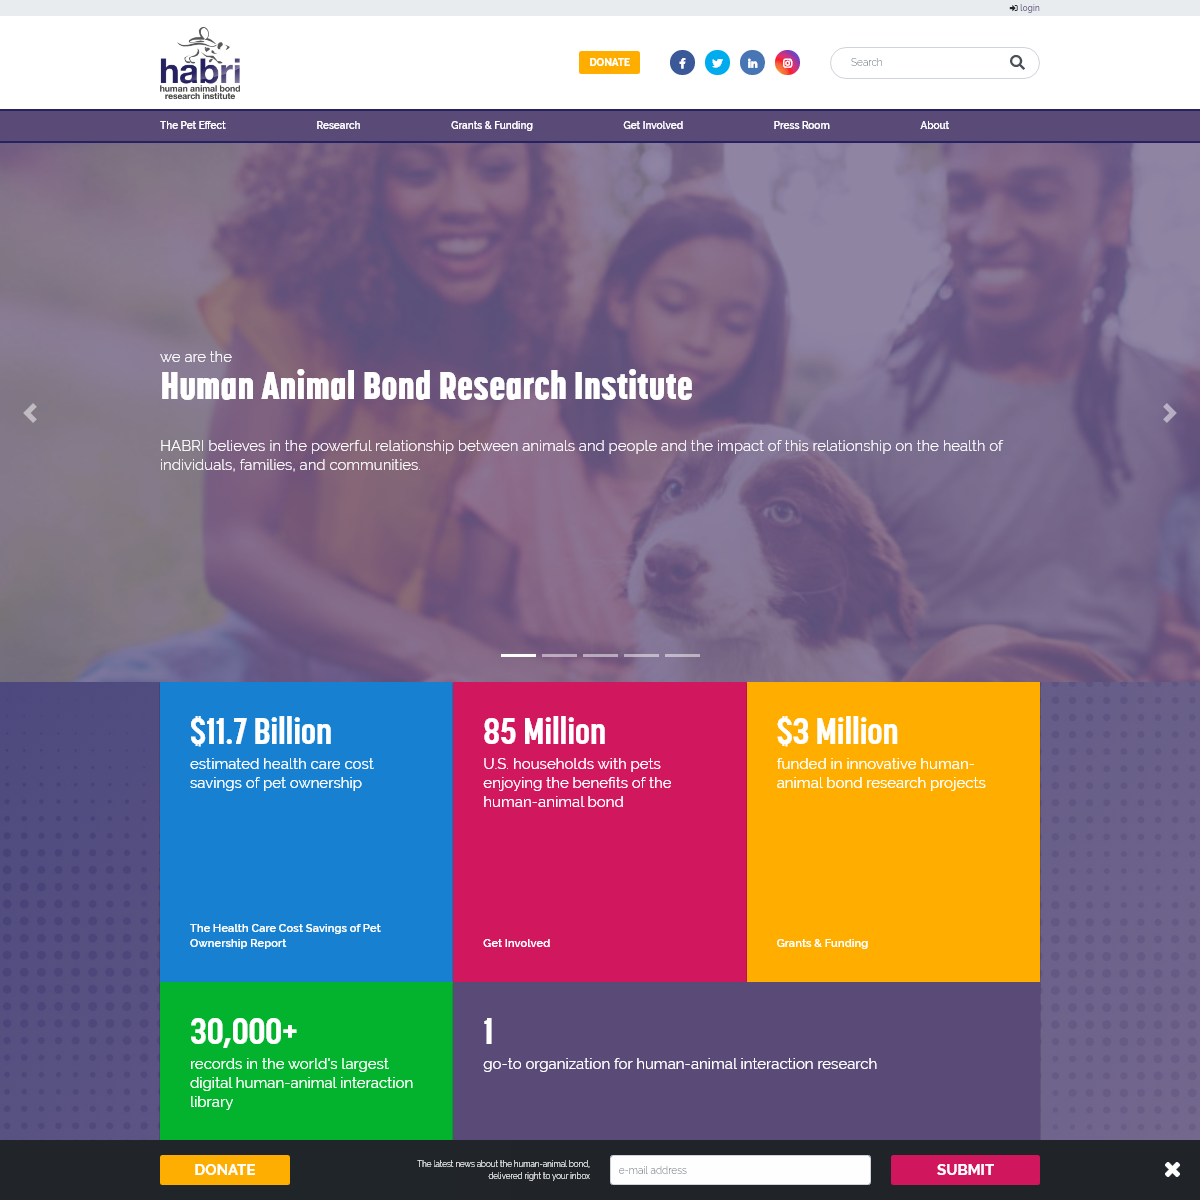 HABRI - The Human Animal Bond Research Institute